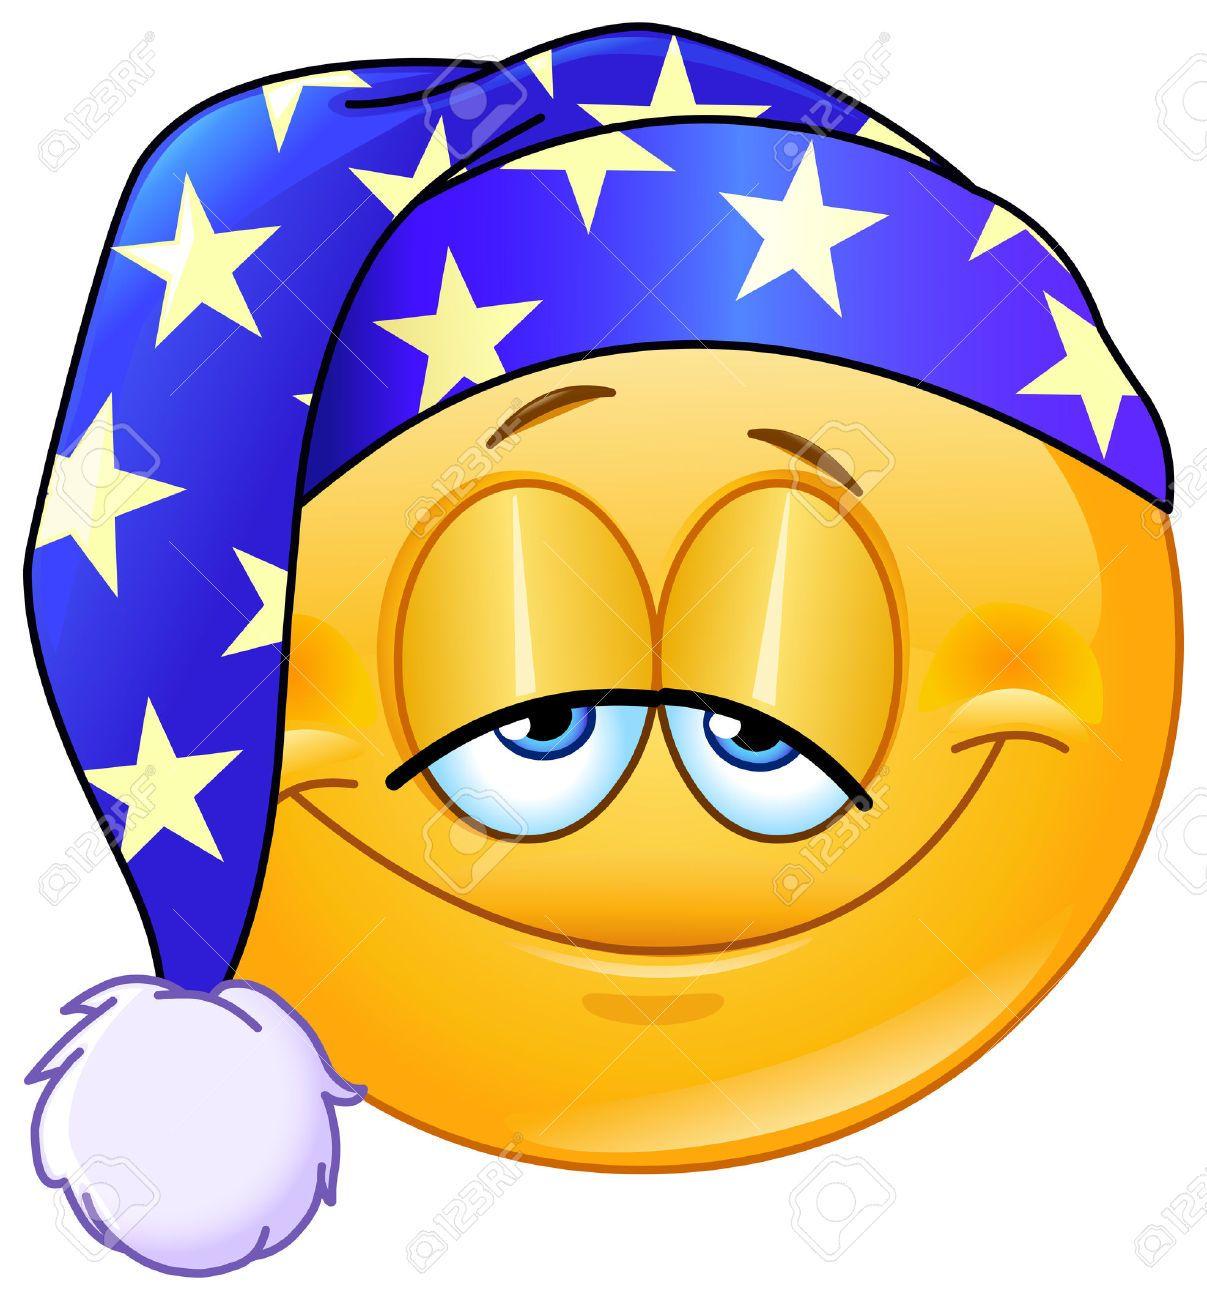 Nightcap clipart clipart royalty free stock Stock Vector | ستيكرز | Smiley, Emoticon faces, Facebook emoticons clipart royalty free stock